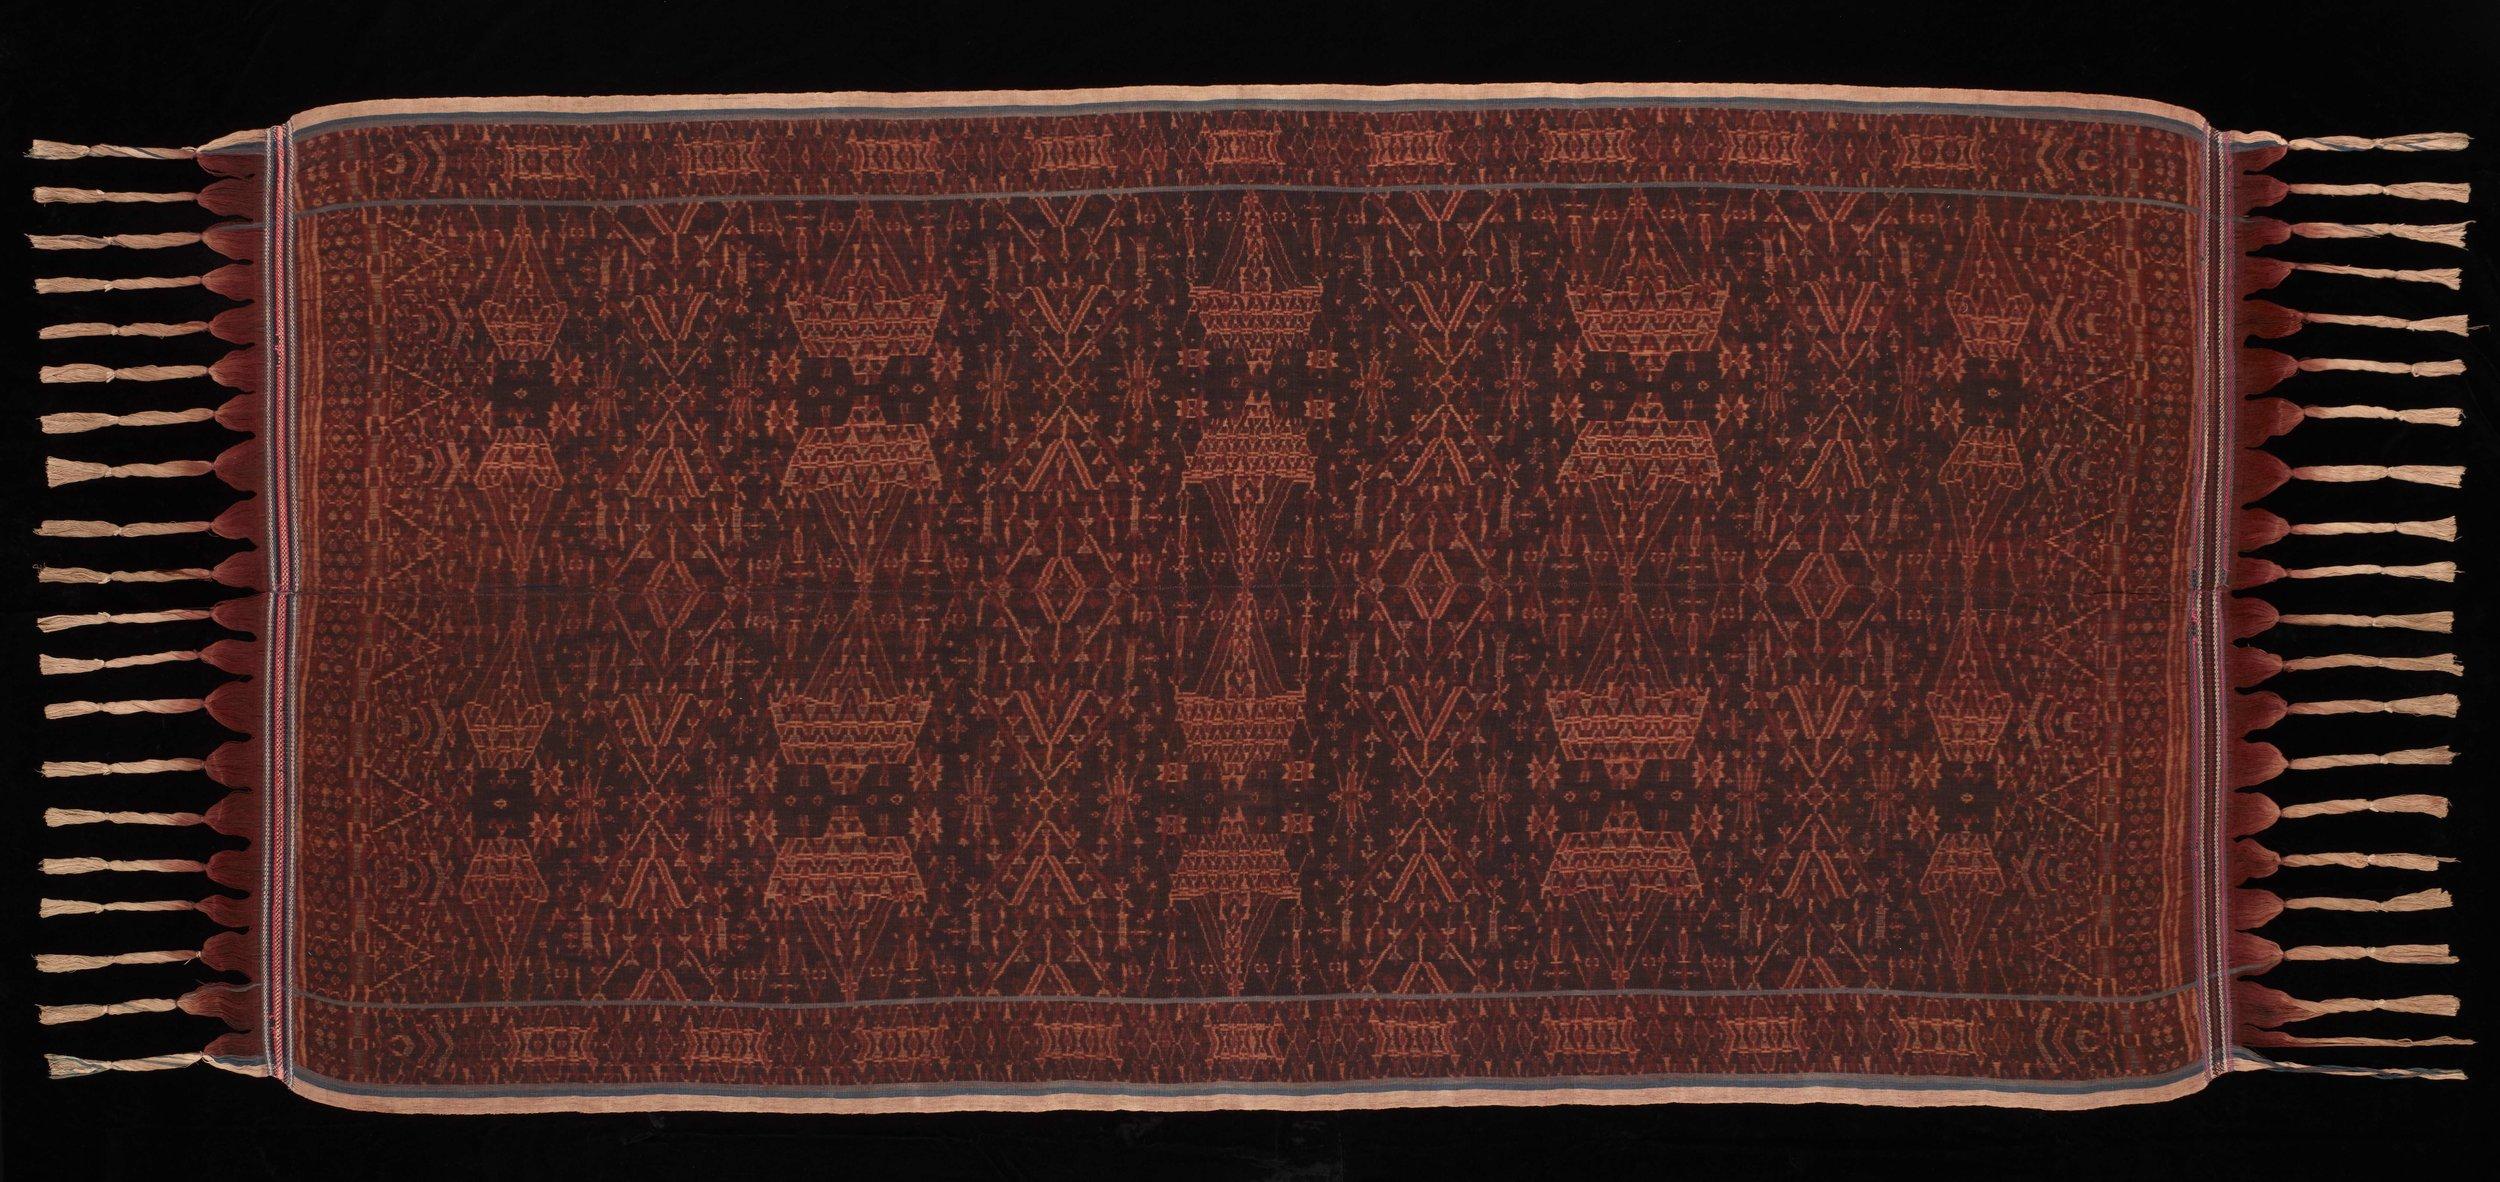 Ikat Selendang  | Lio © The Dallas Museum of Art | Texas, USA